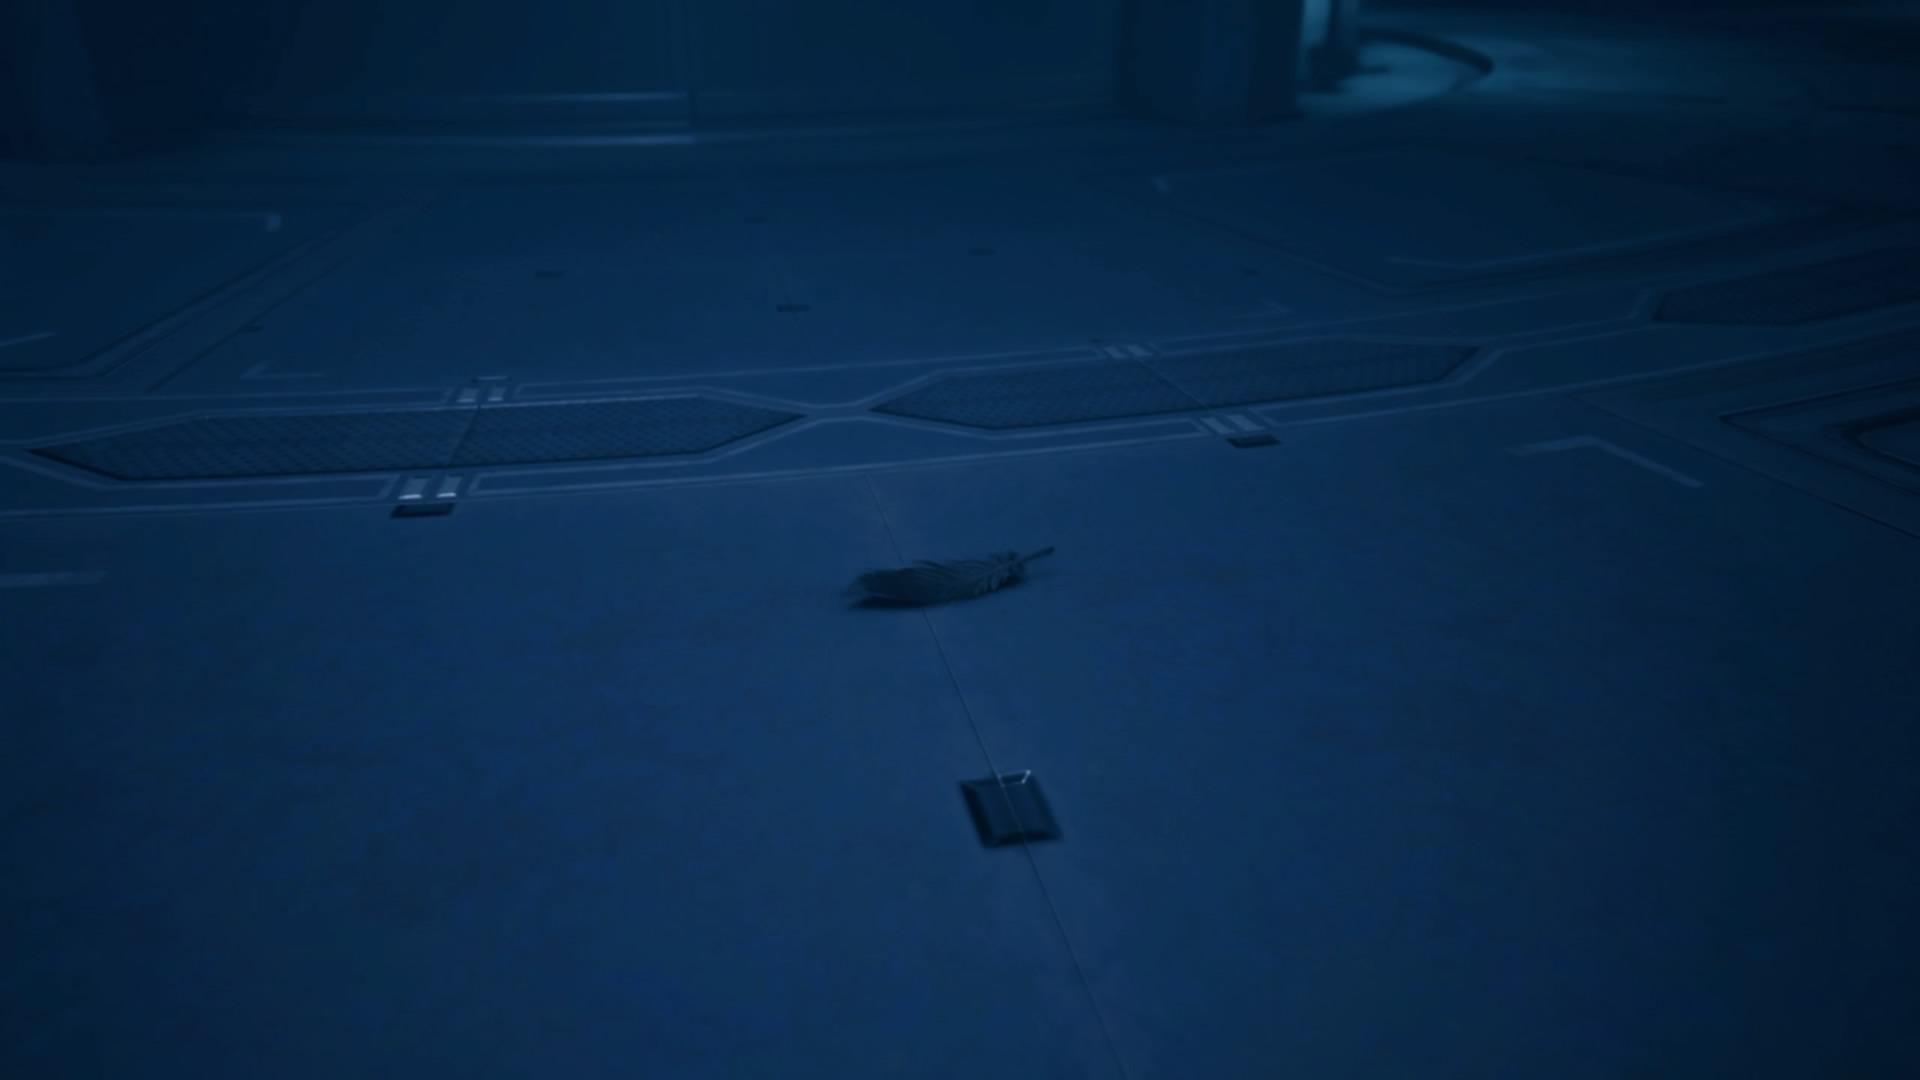 【FF7REMAKE】第68回攻略・感想:深淵との邂逅